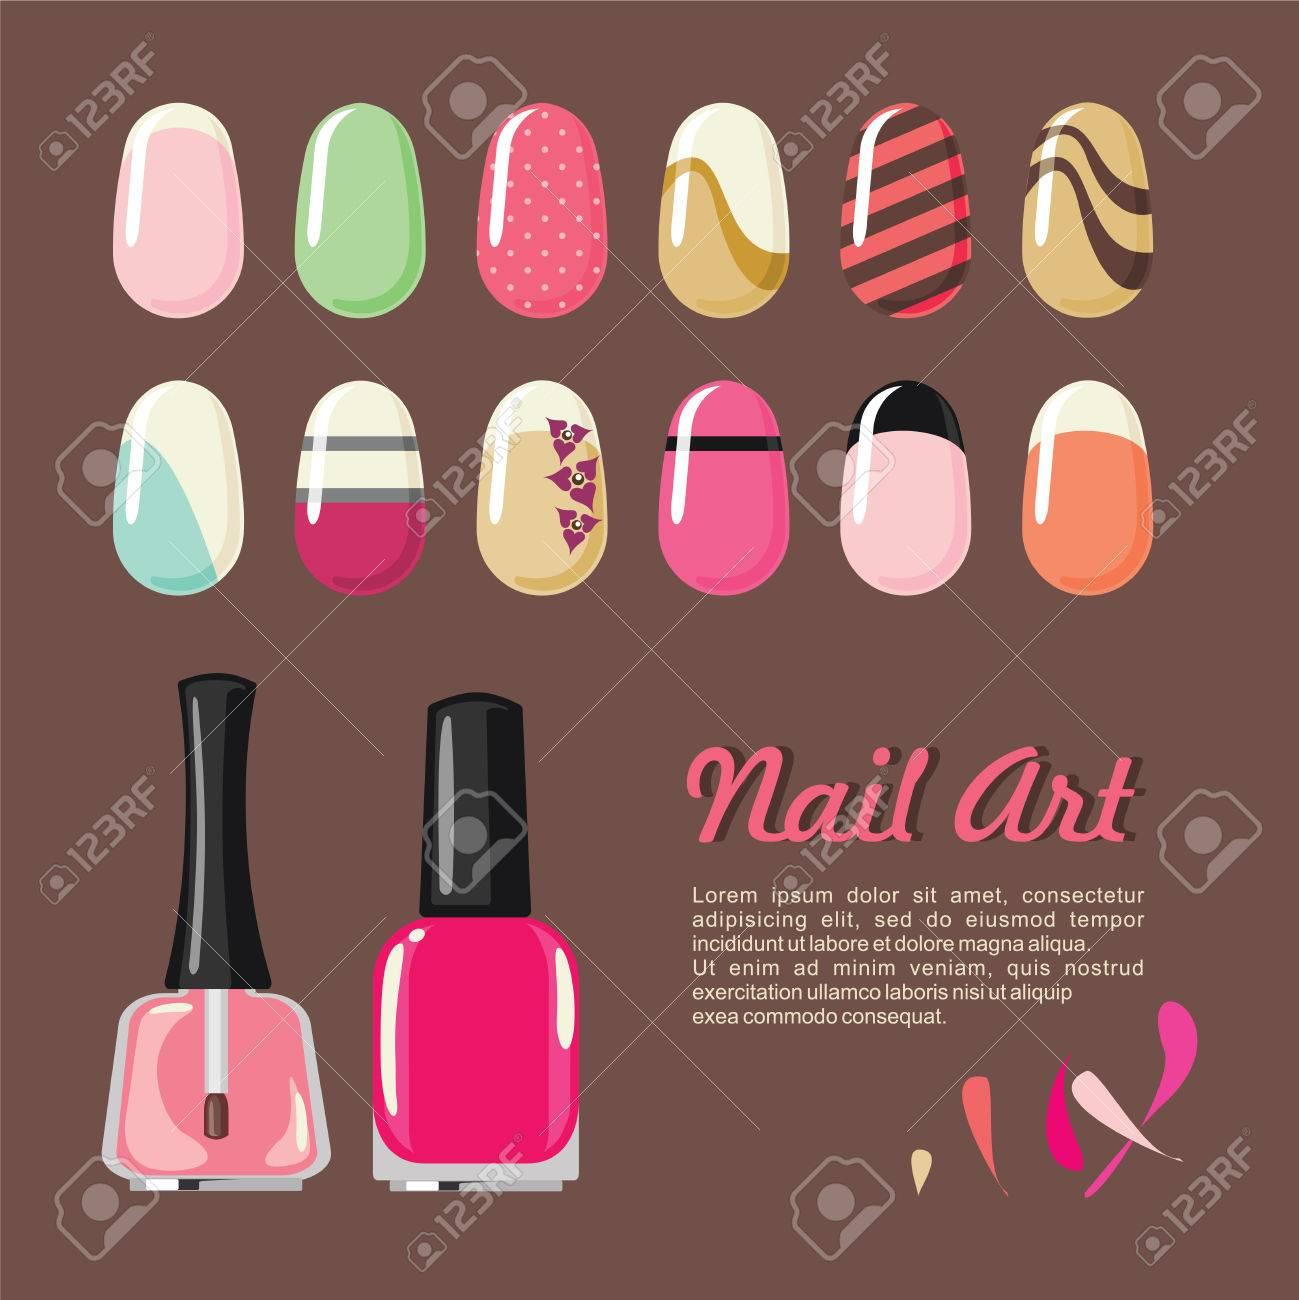 Nails Art Templates And Polish Bottle For Manicure Salon Services ...